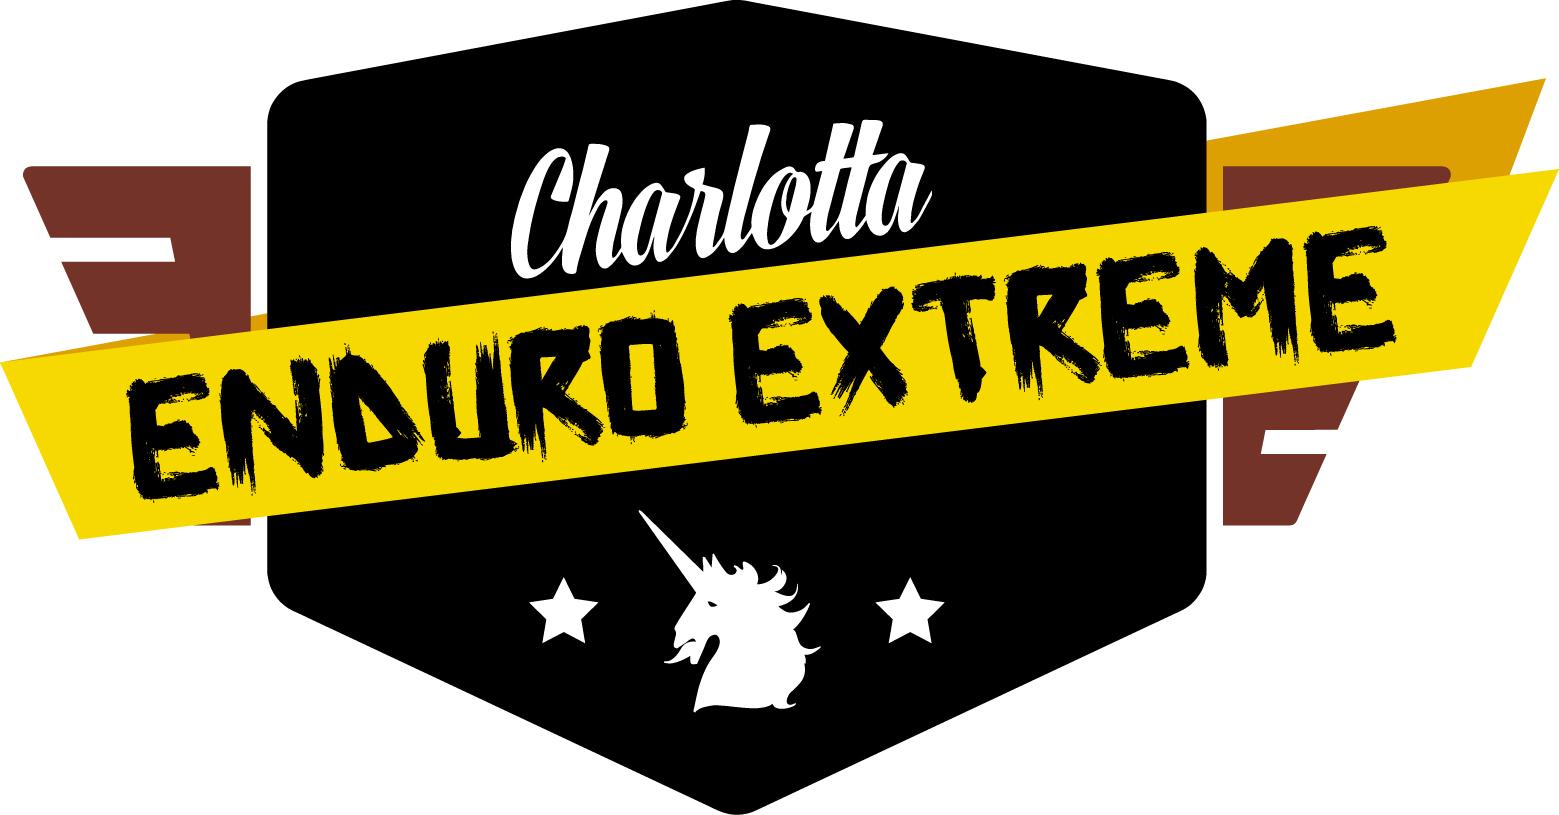 Charlotta-Extreme